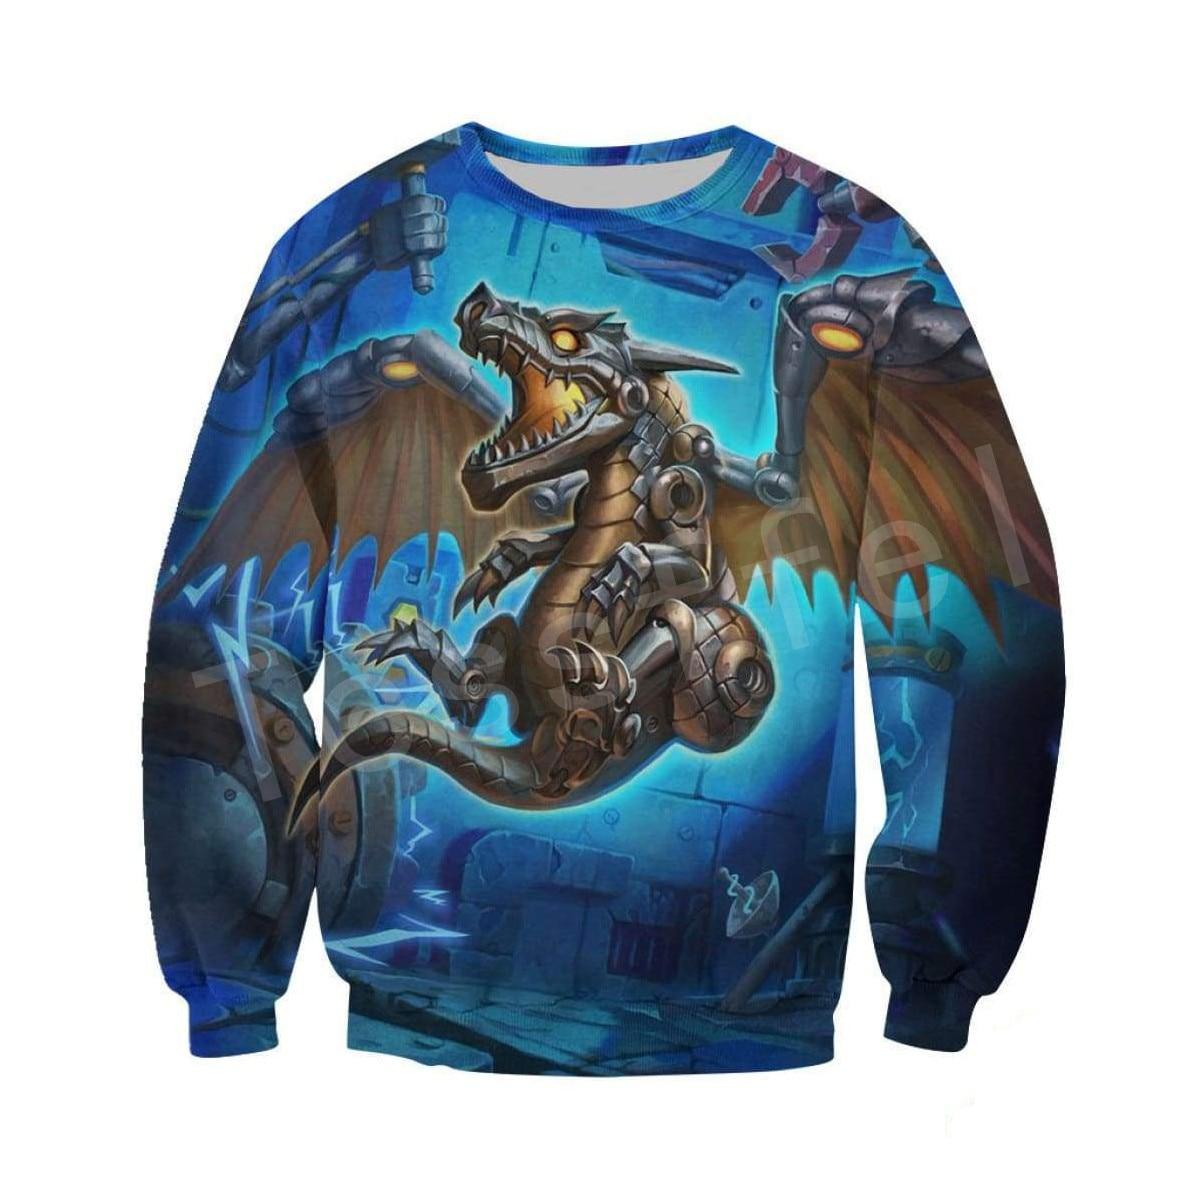 Tessffel Dragon Art Animal Harajuku MenWomen HipHop 3DPrinted Sweatshirts hoodie jackt shirts Tracksuits Casual Colorful Style11 in Hoodies amp Sweatshirts from Men 39 s Clothing